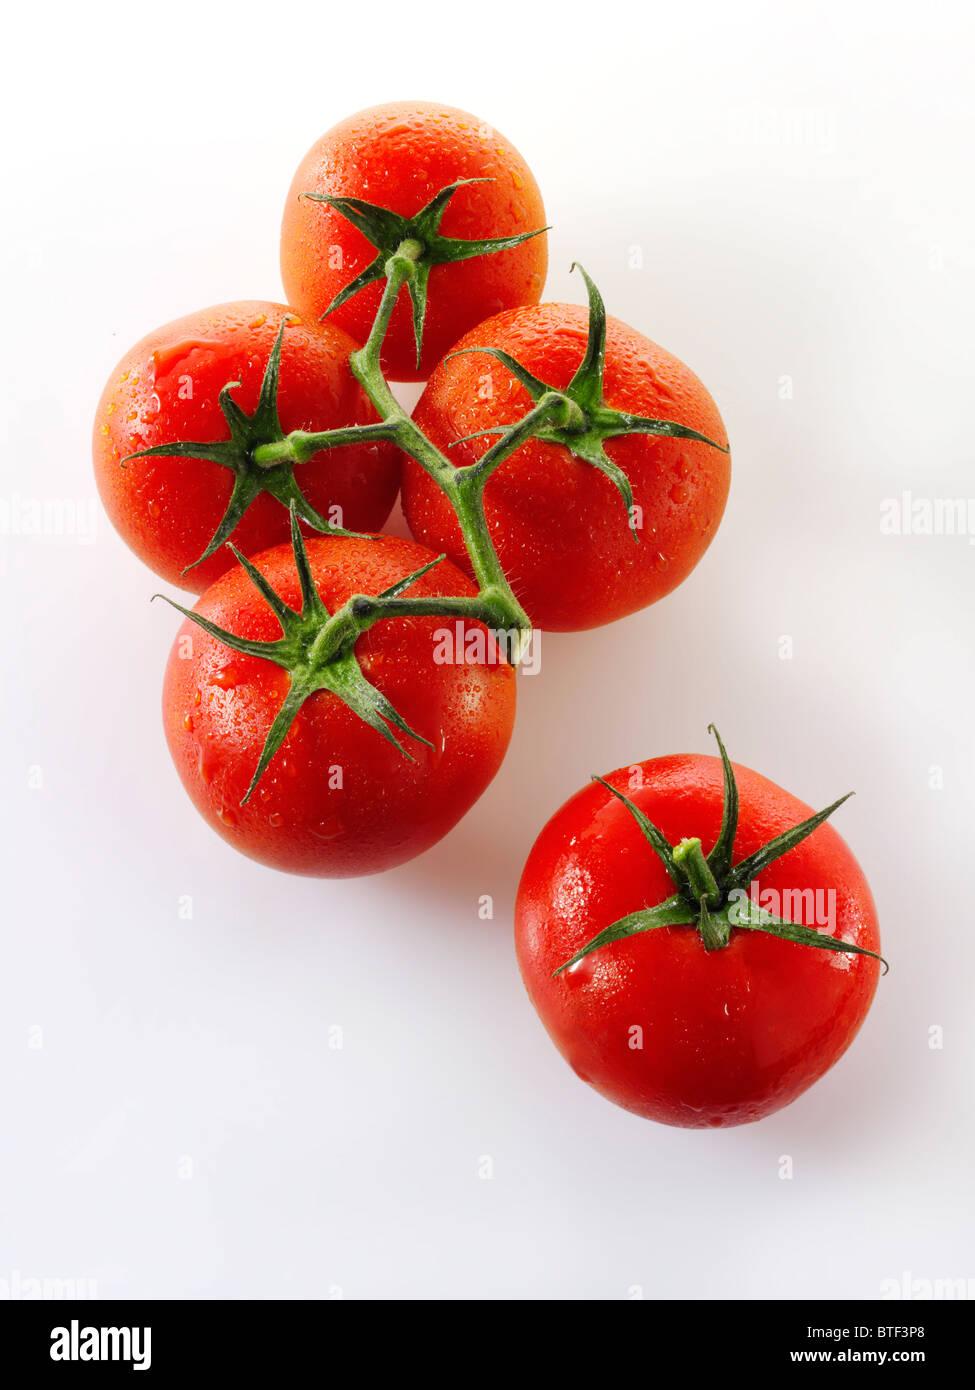 Jubilee vine tomatoes - Stock Image